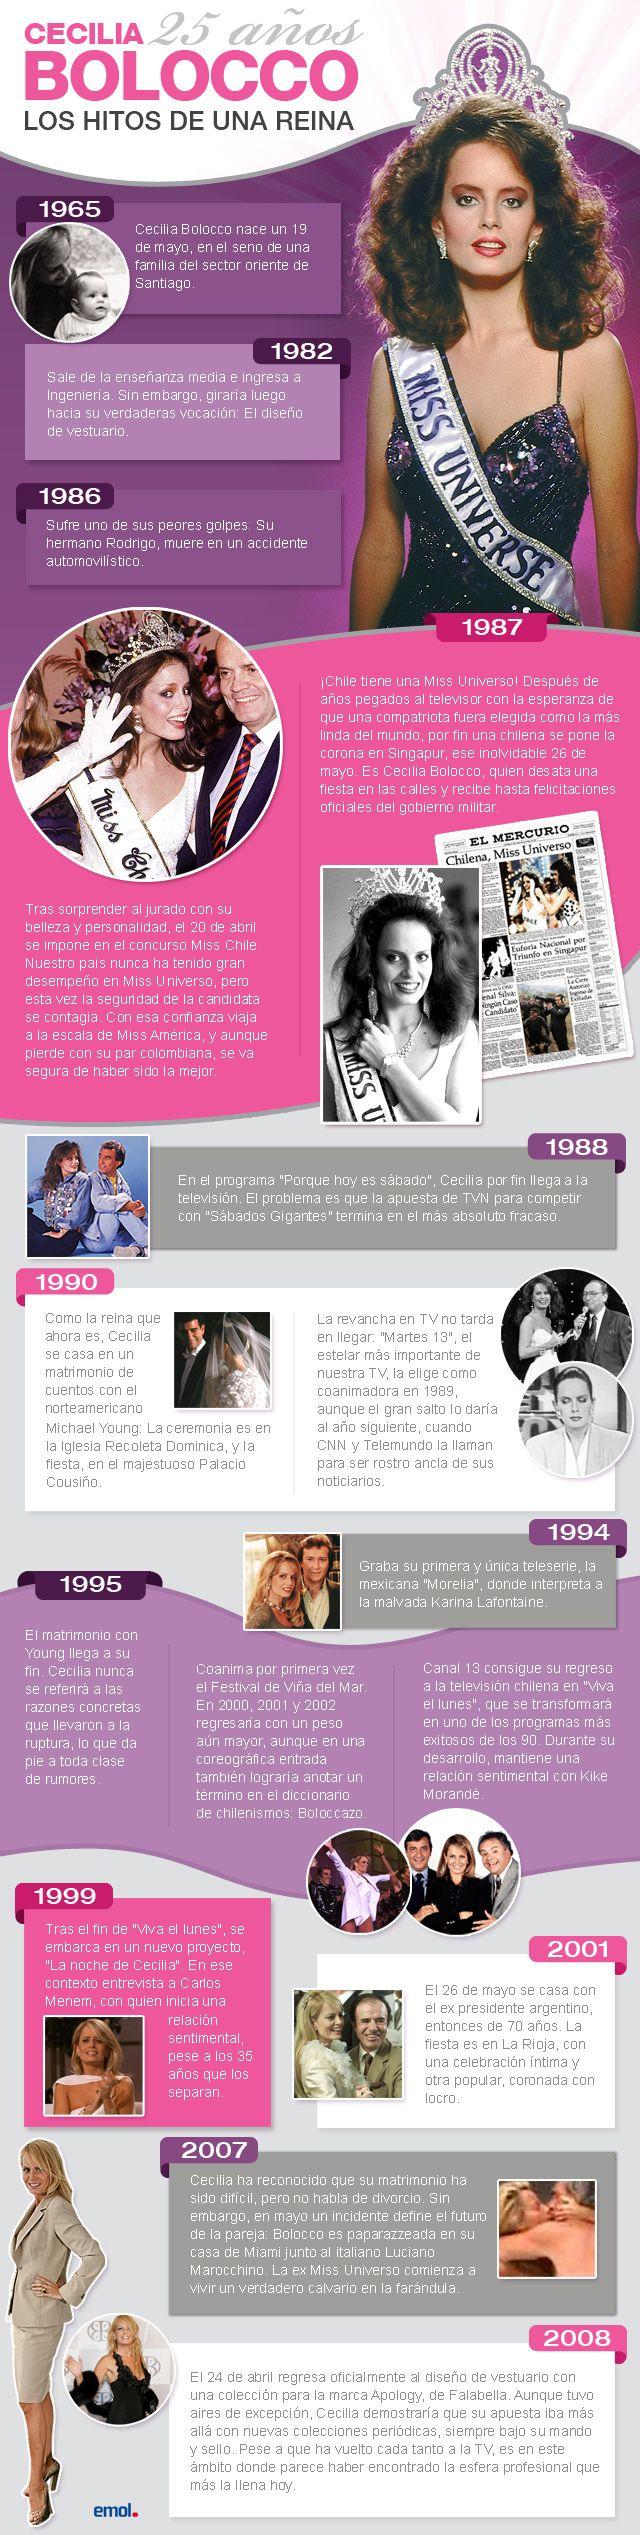 Cecilia Bolocco. #infografia #infographic